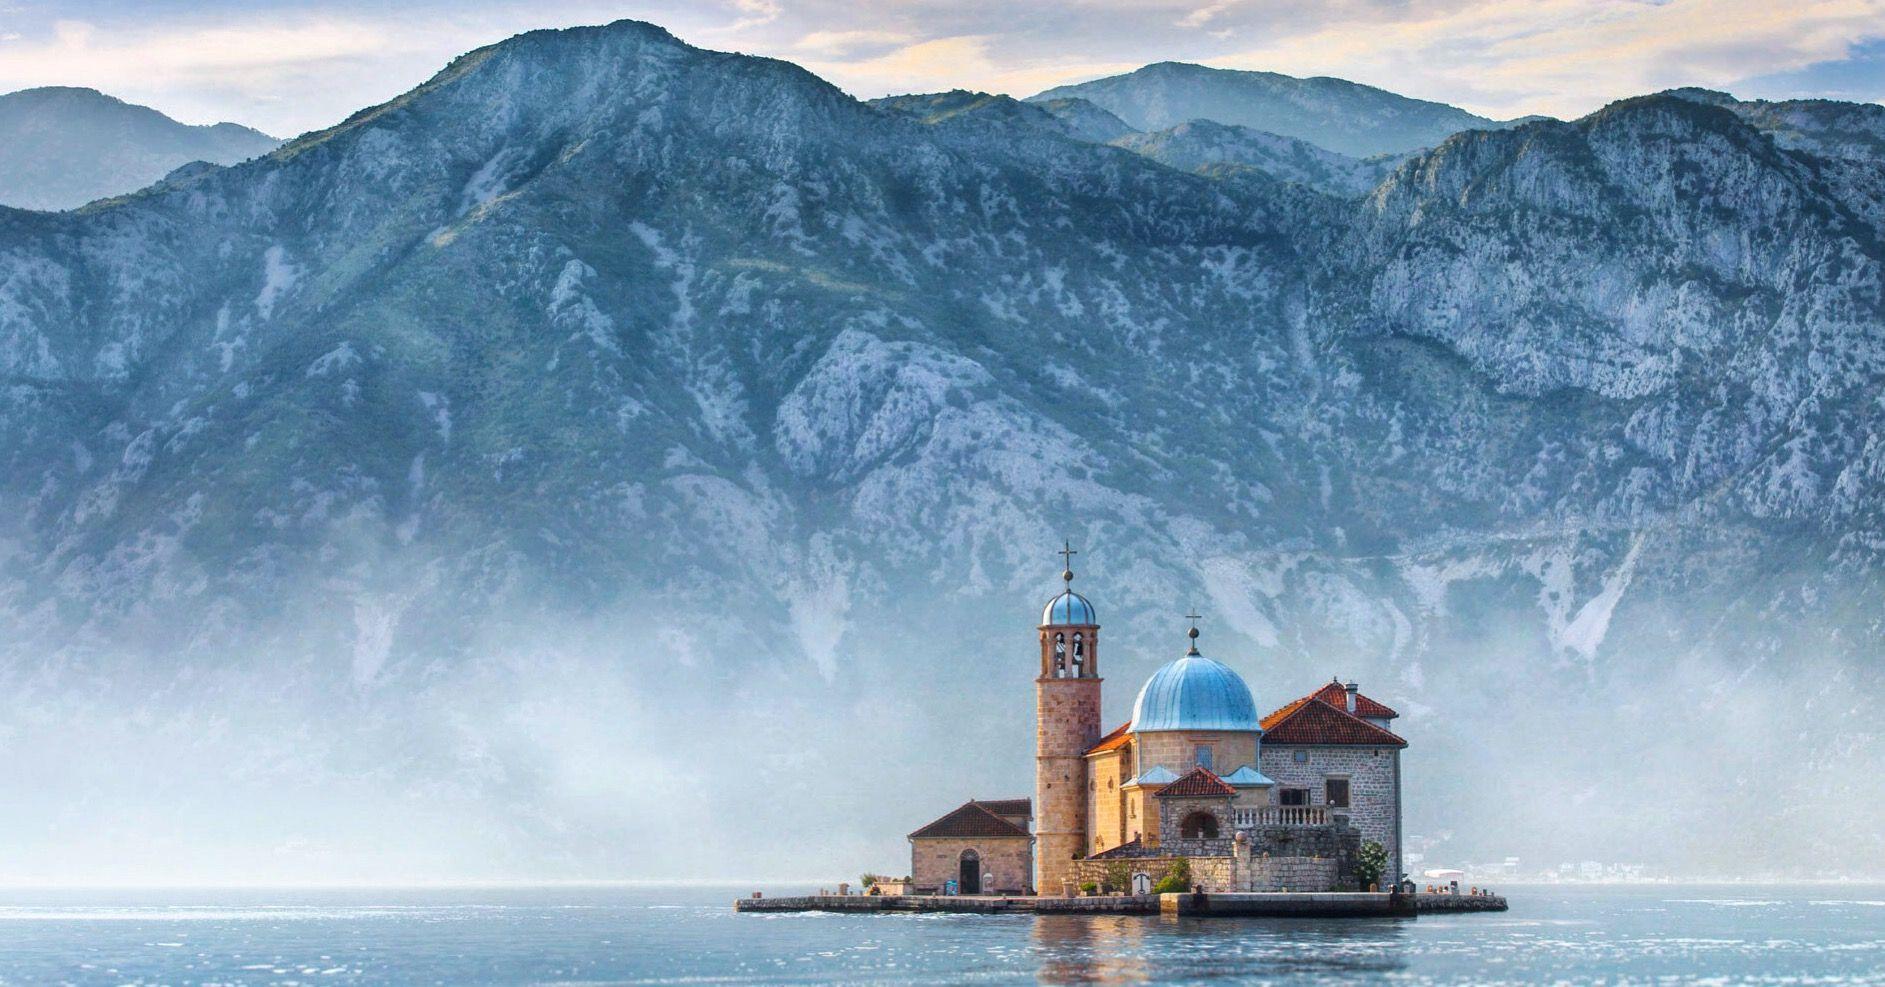 Bay of Kotor #UNESCO World Heritage Site